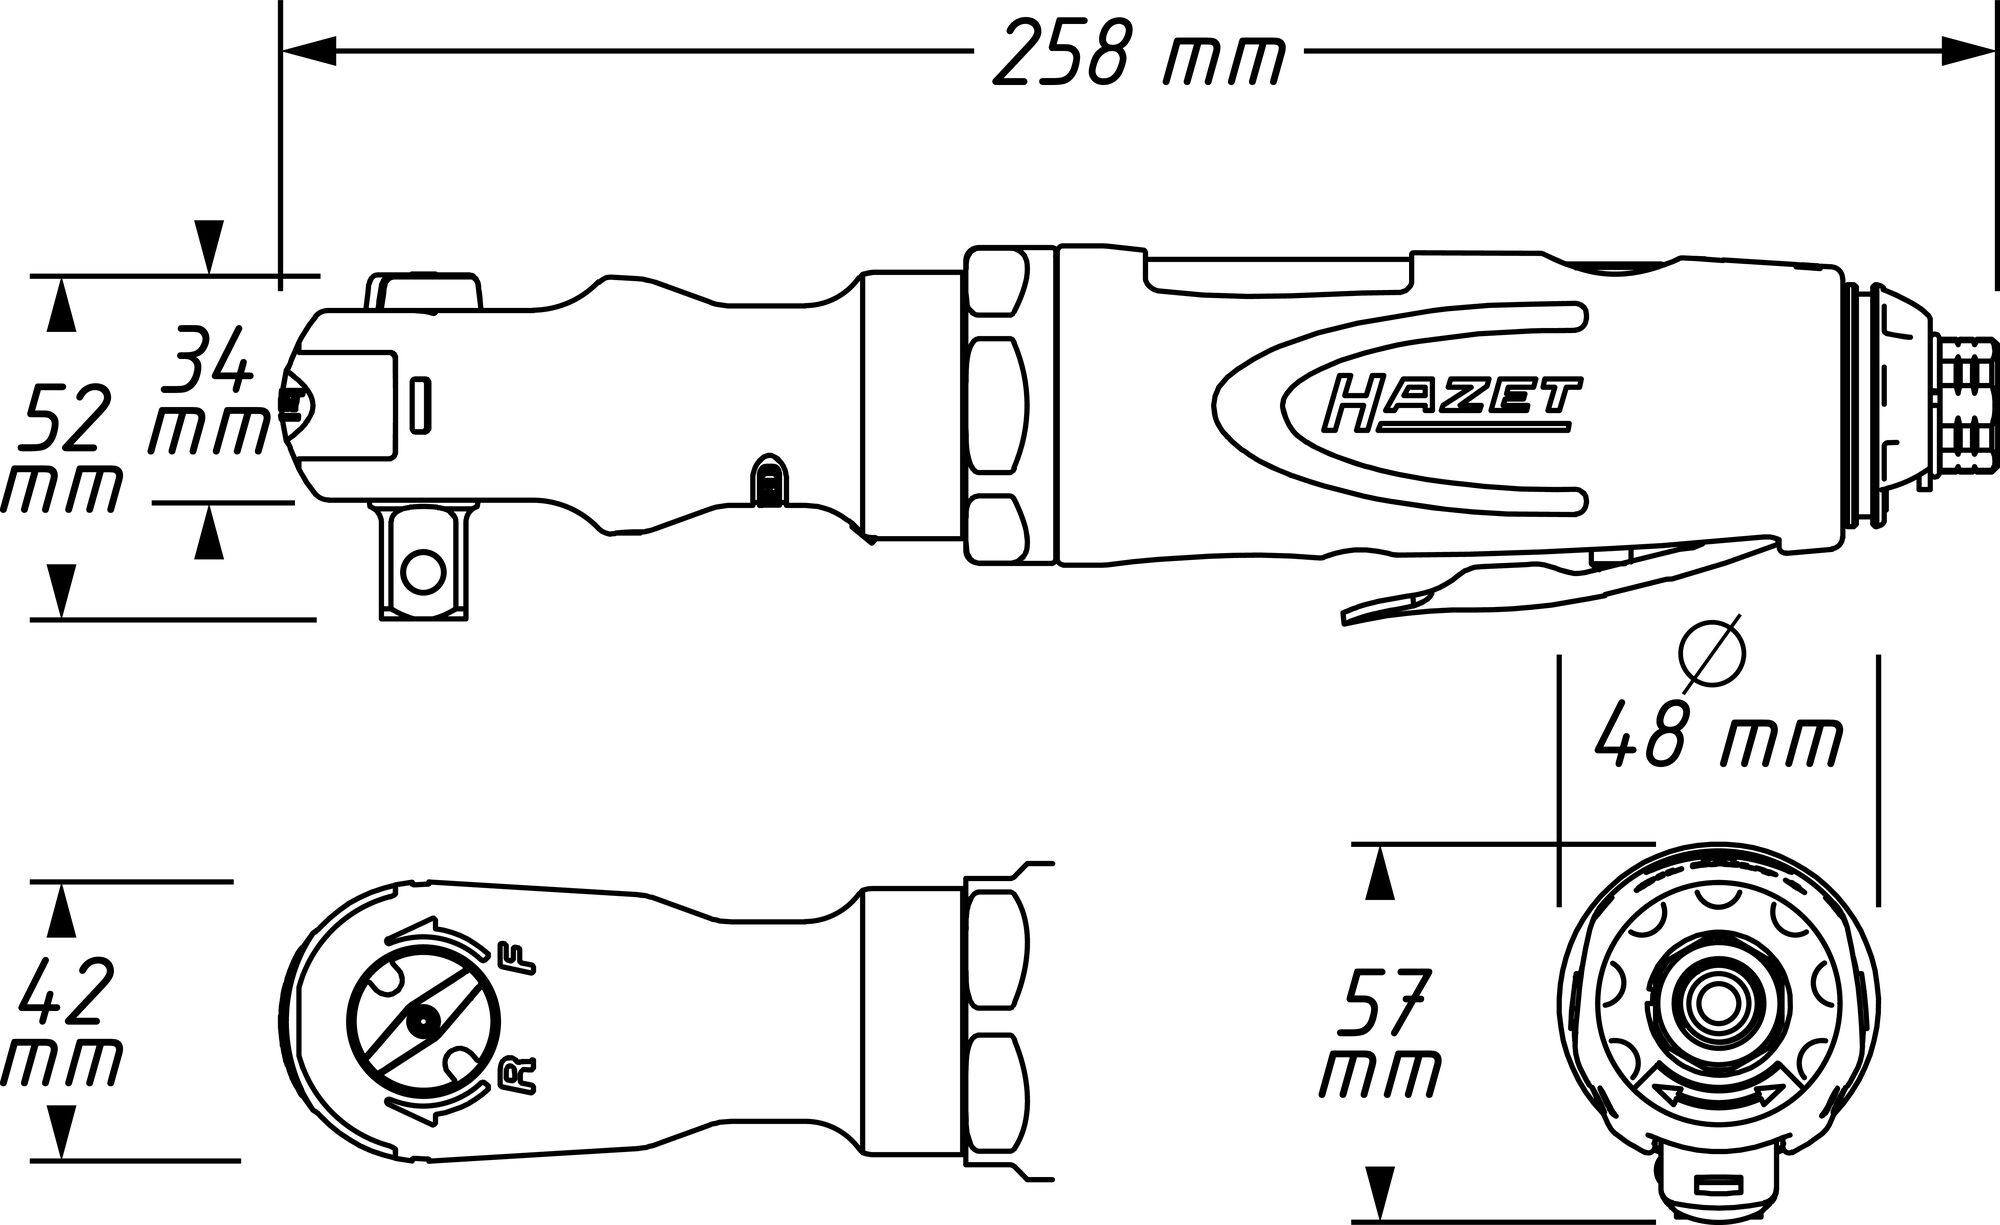 HAZET Ratschenschrauber 9022P-2 ∙ Vierkant massiv 12,5 mm (1/2 Zoll)